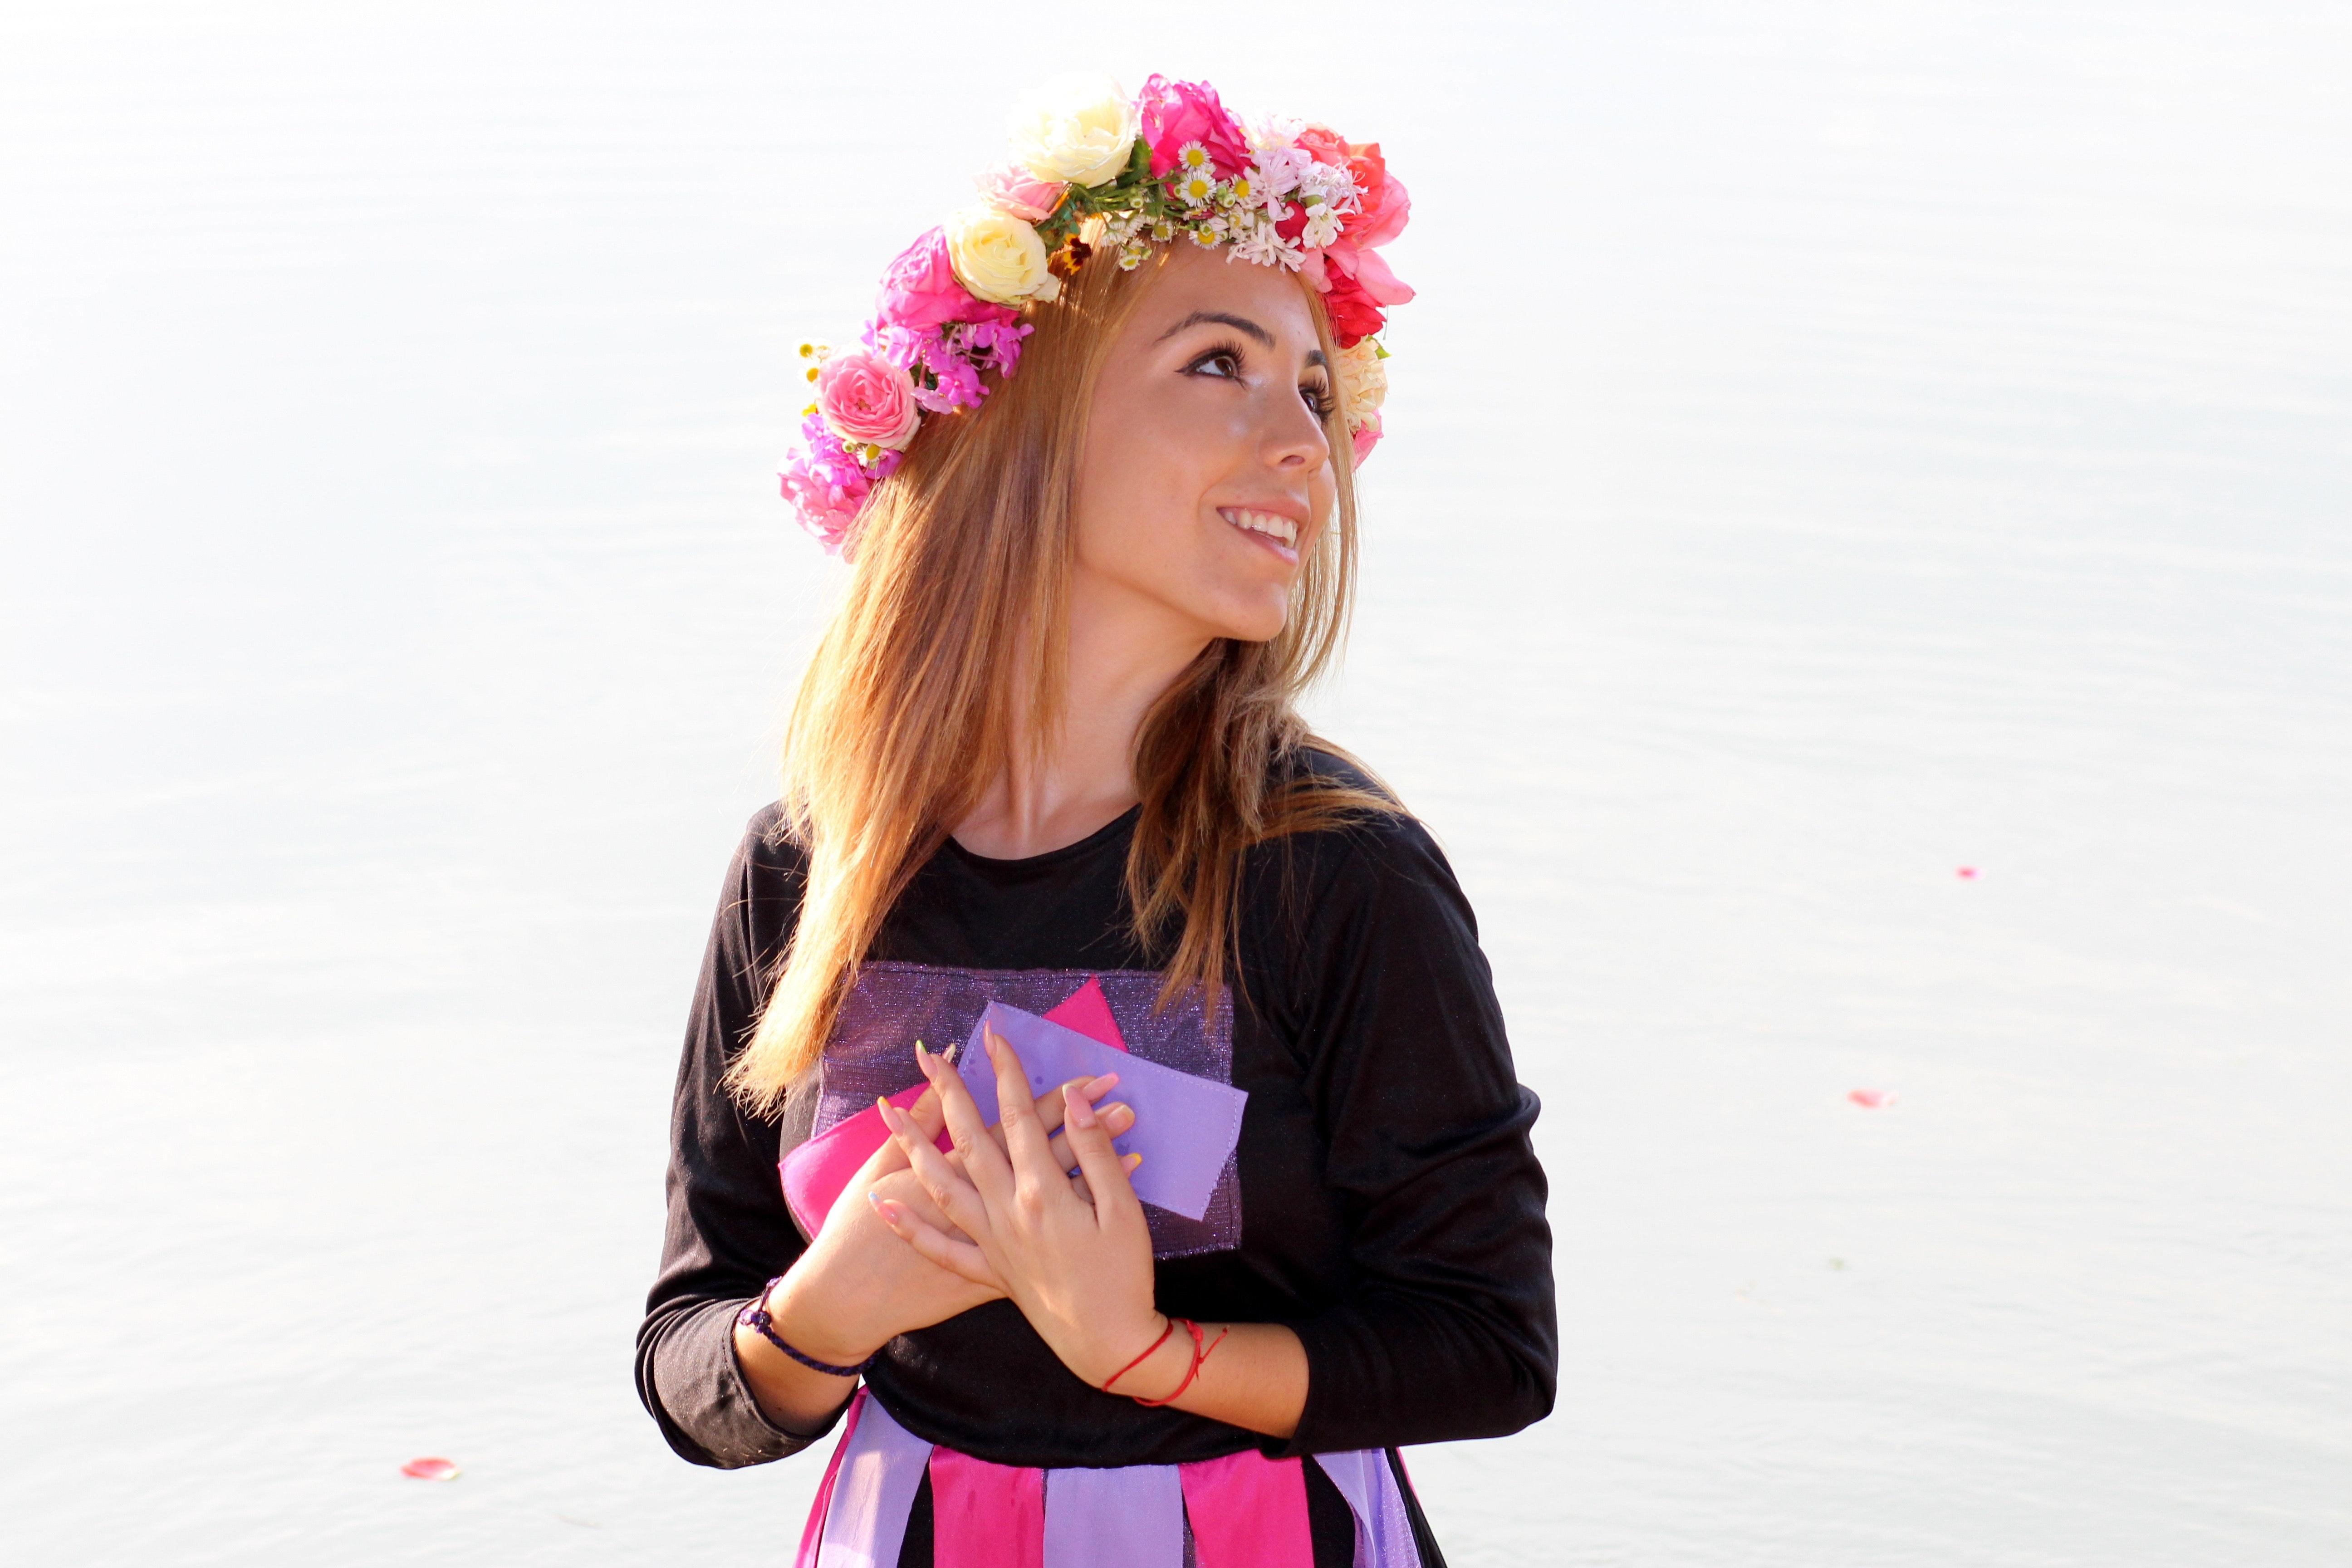 Blond Blumenmädchen